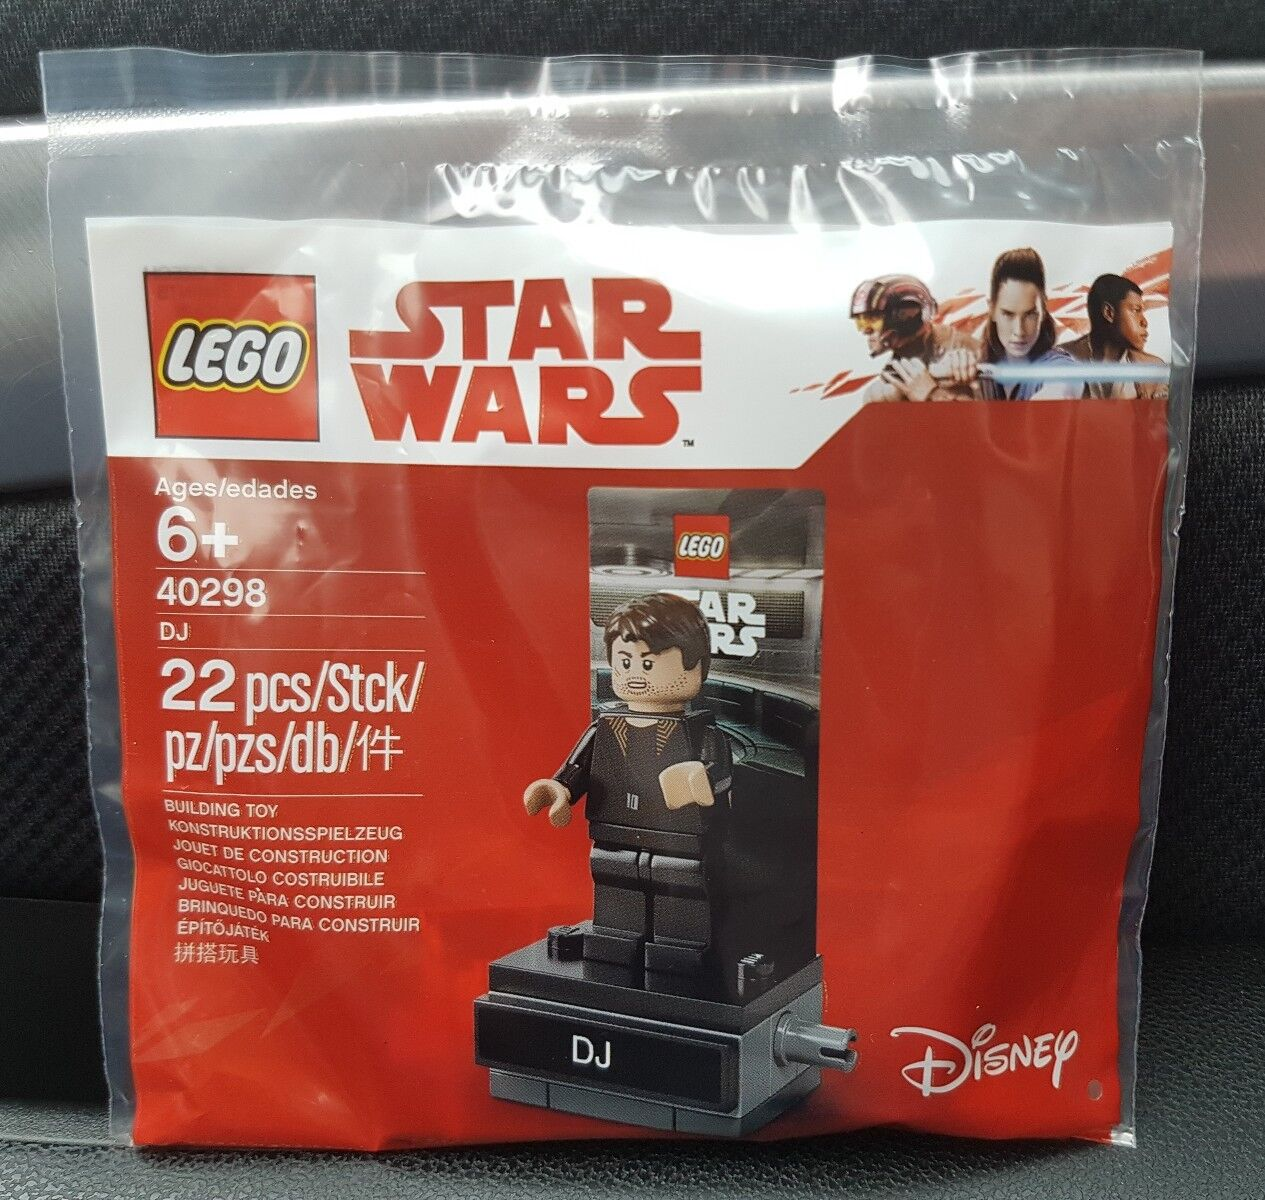 10 x LEGO Star Wars 40298 Polybag - DJ Code Breaker minifigure BRAND NEW sw903